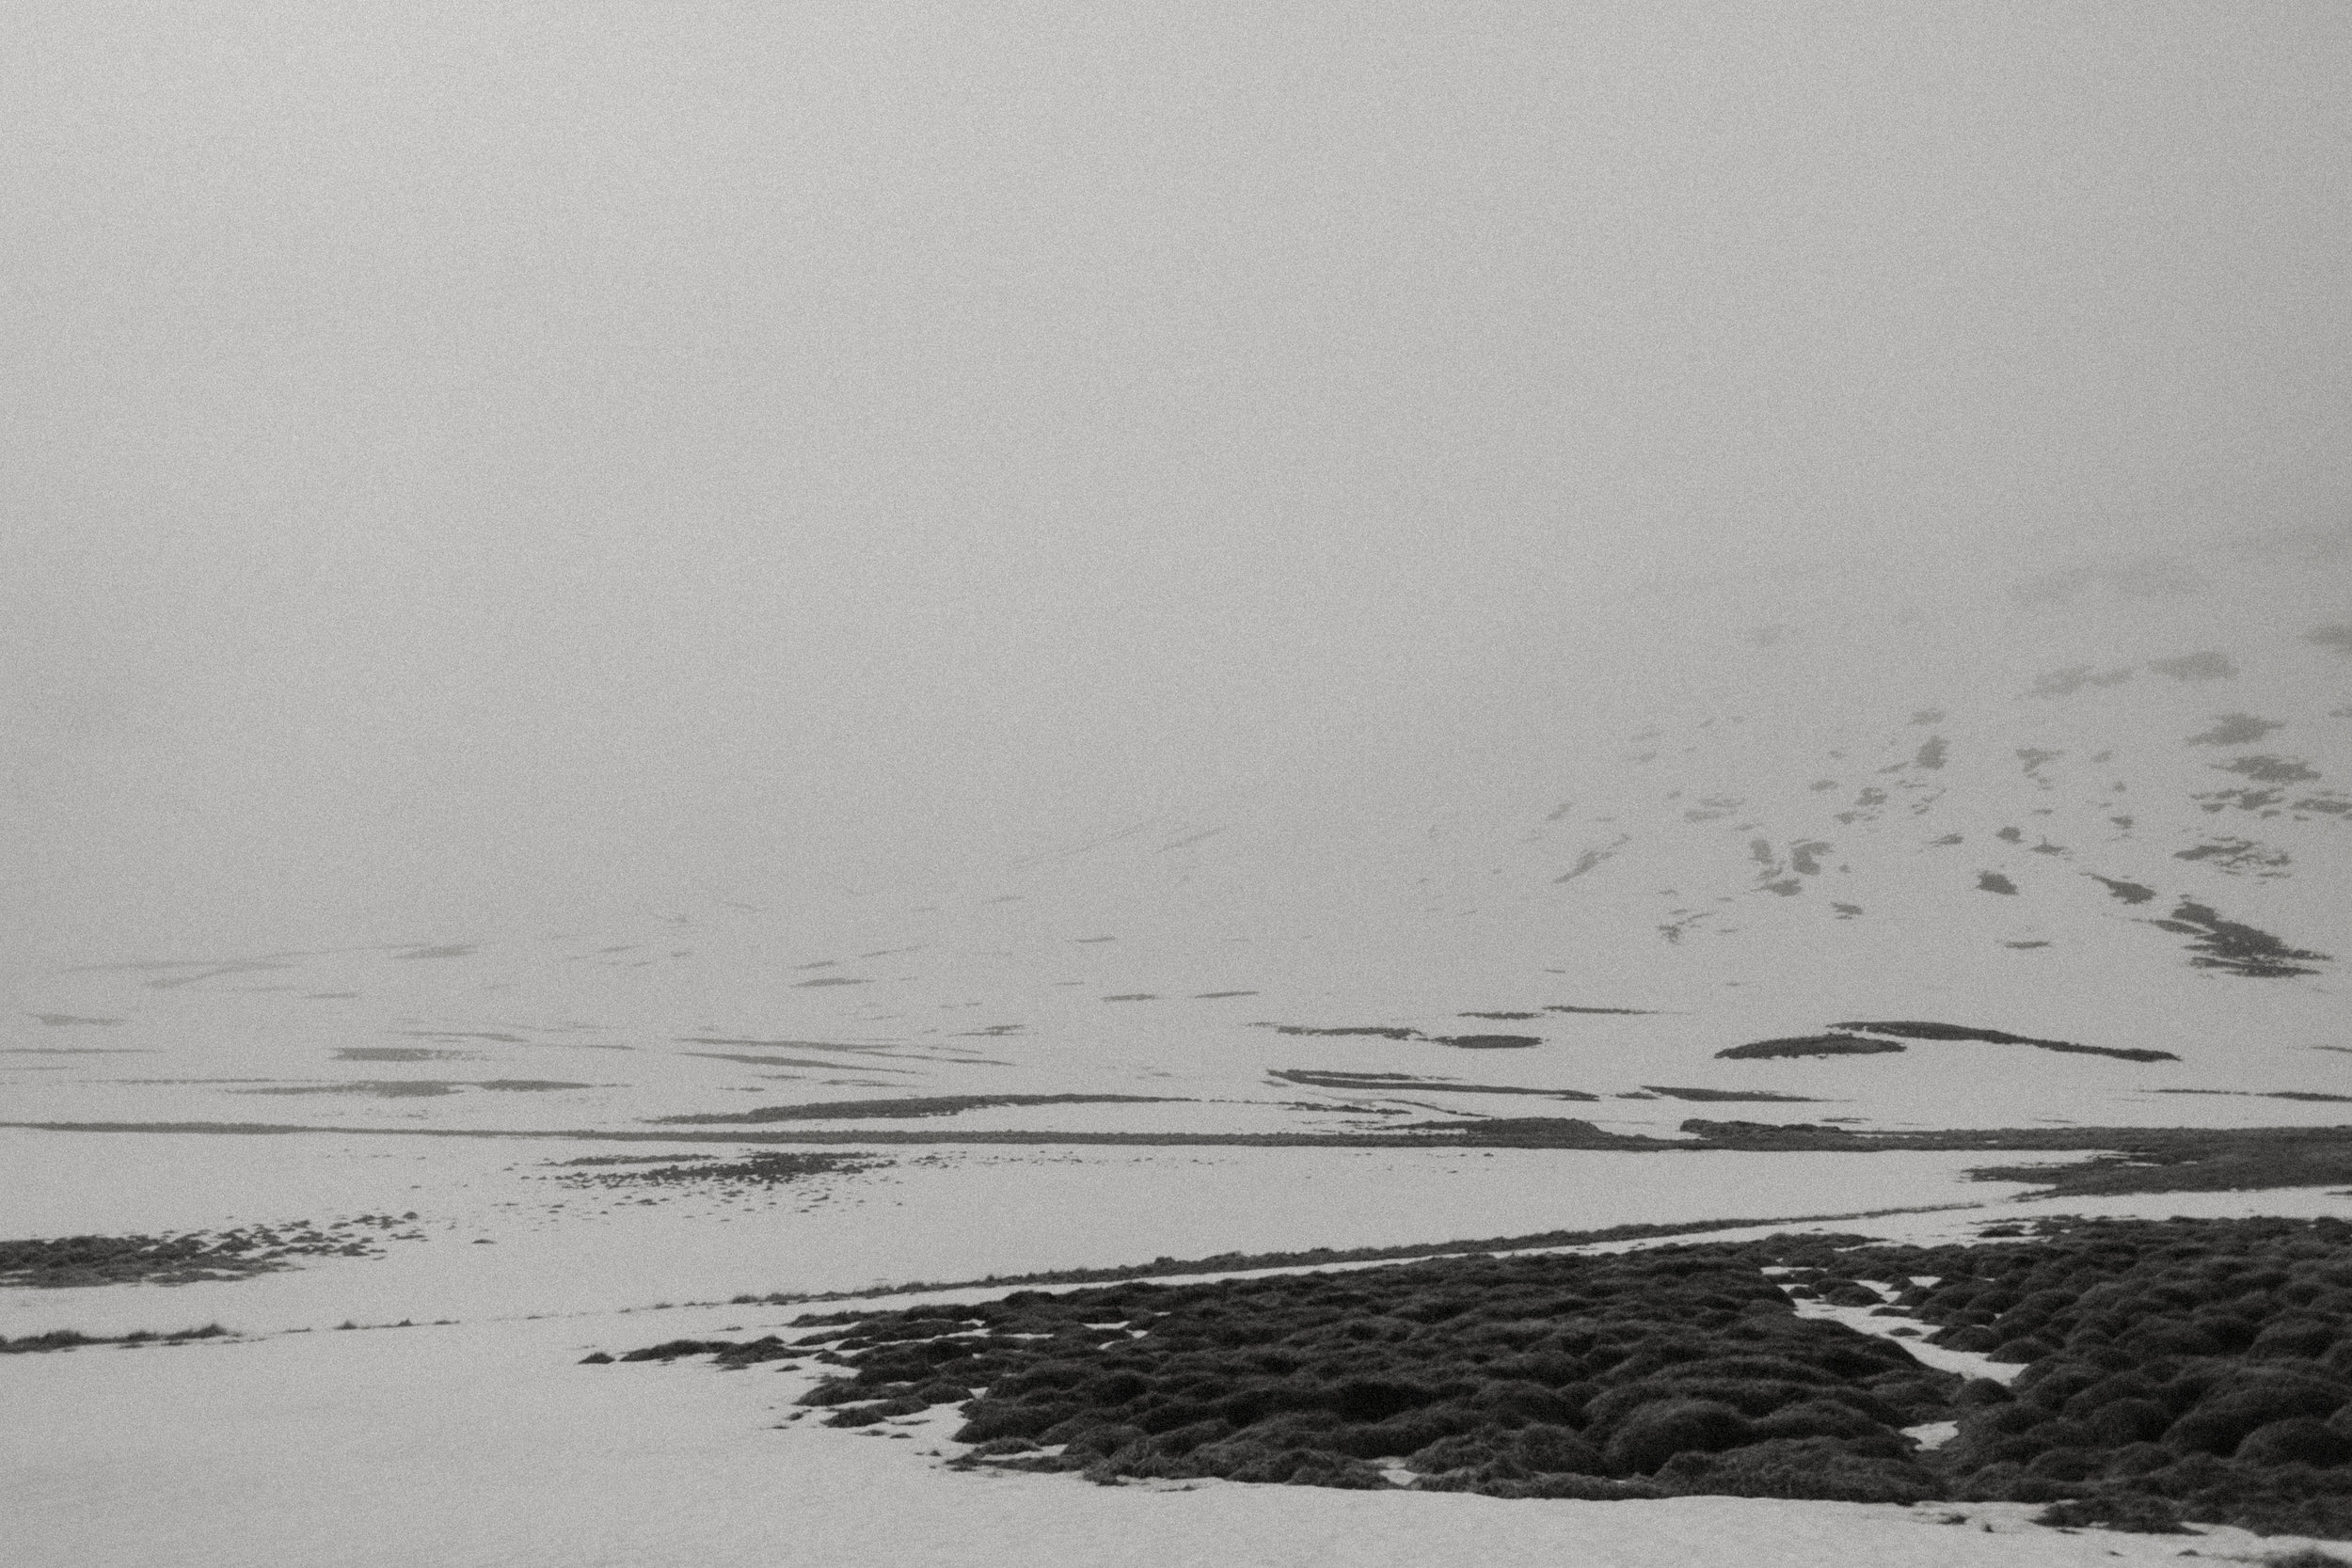 Iceland-honeymoon-4252.jpg